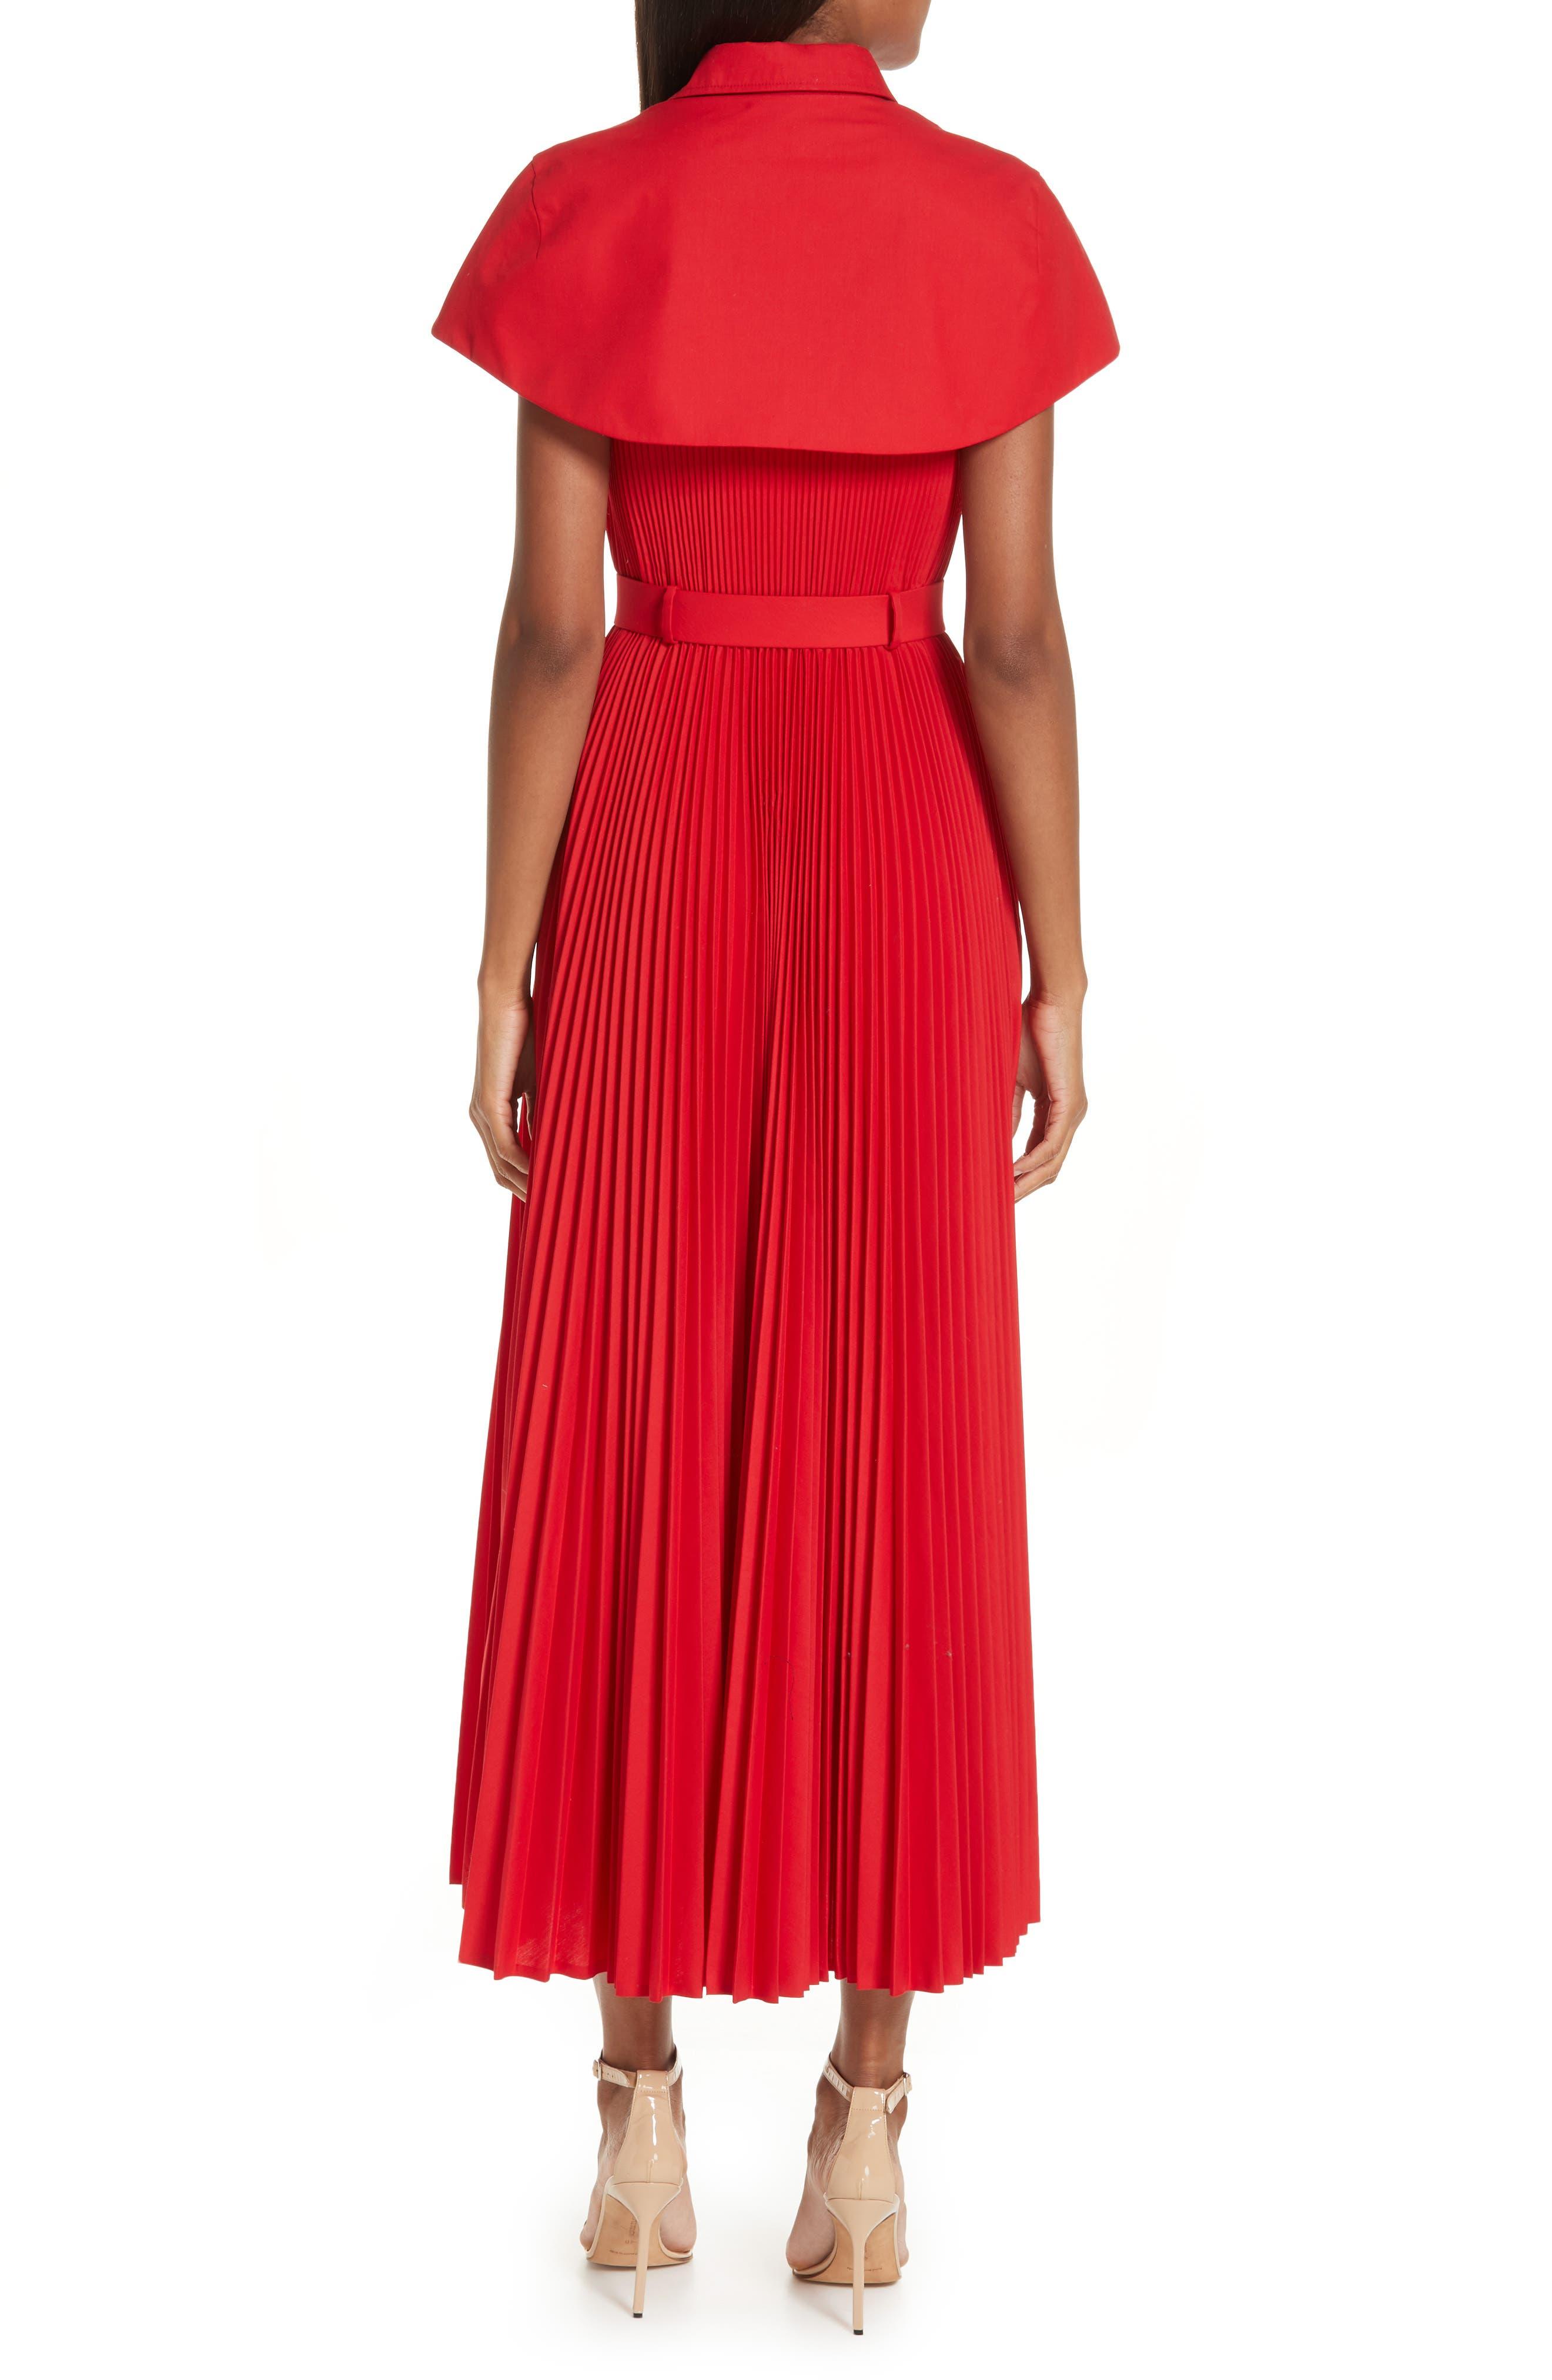 c34dea7bfb1 Women s Brandon Maxwell Sale Dresses